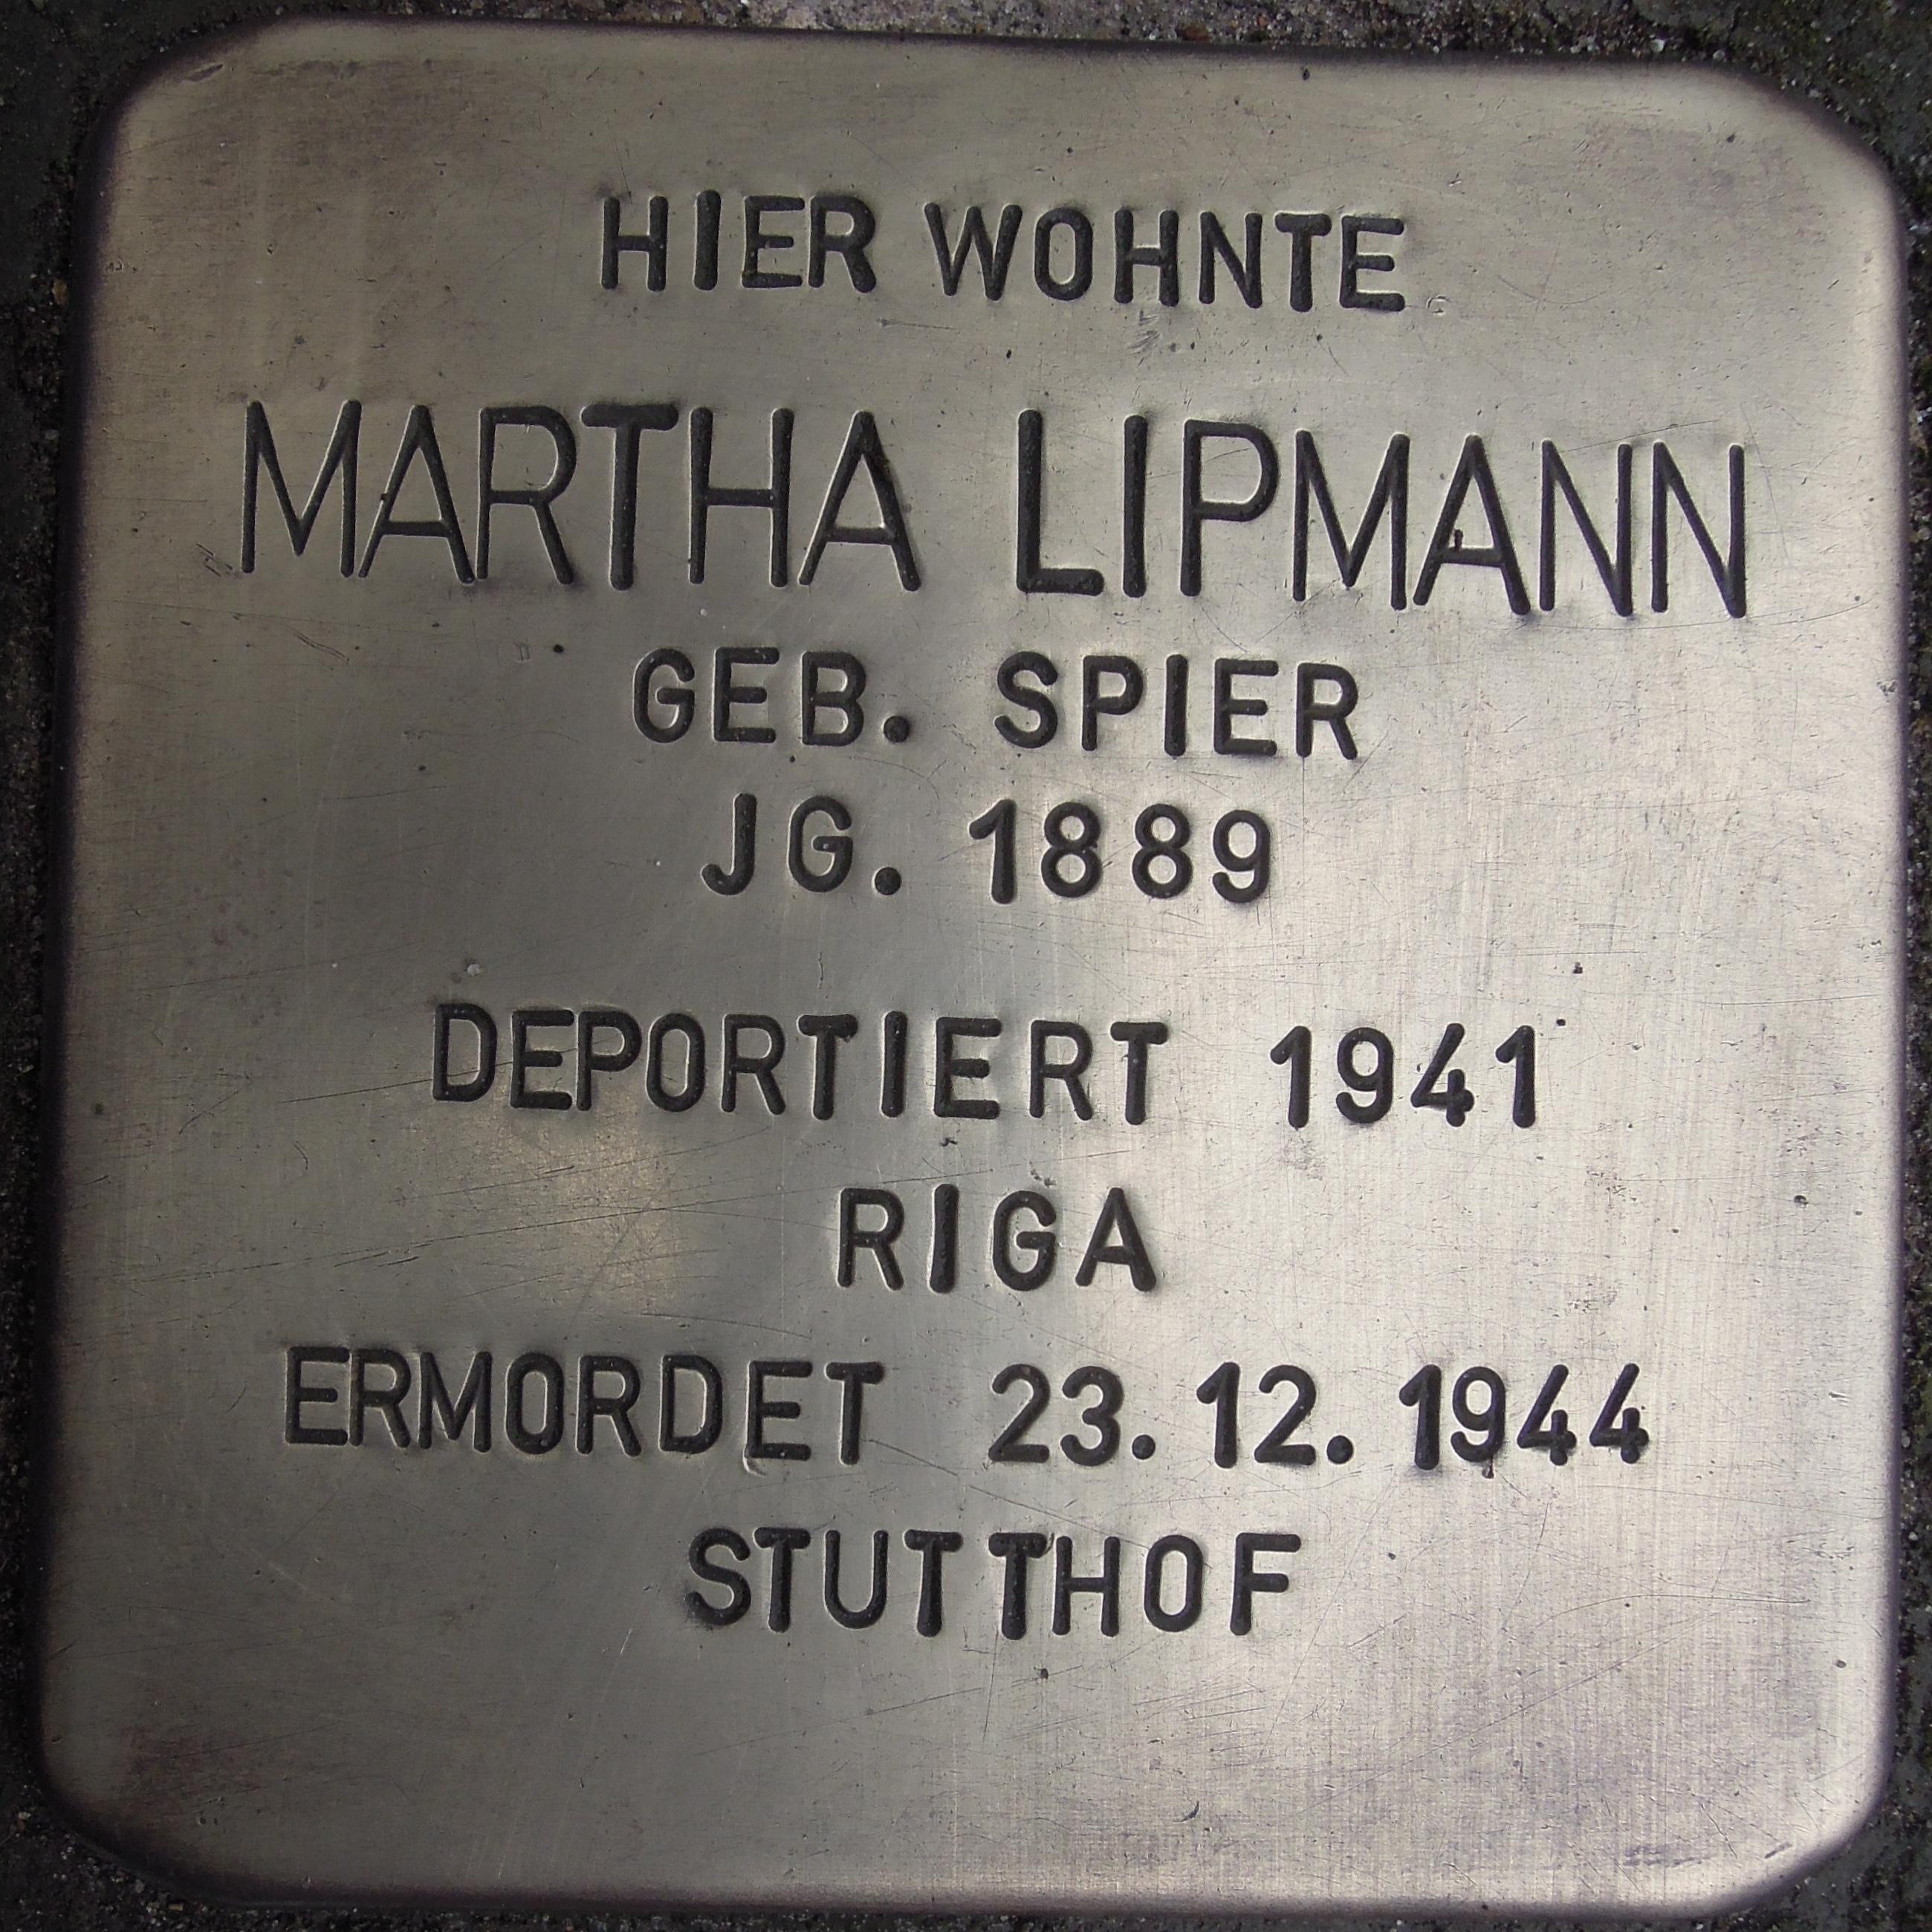 https://upload.wikimedia.org/wikipedia/commons/5/50/Stolperstein_Stolzenau_Bahnhofstra%C3%9Fe_13_Martha_Litmann.jpg